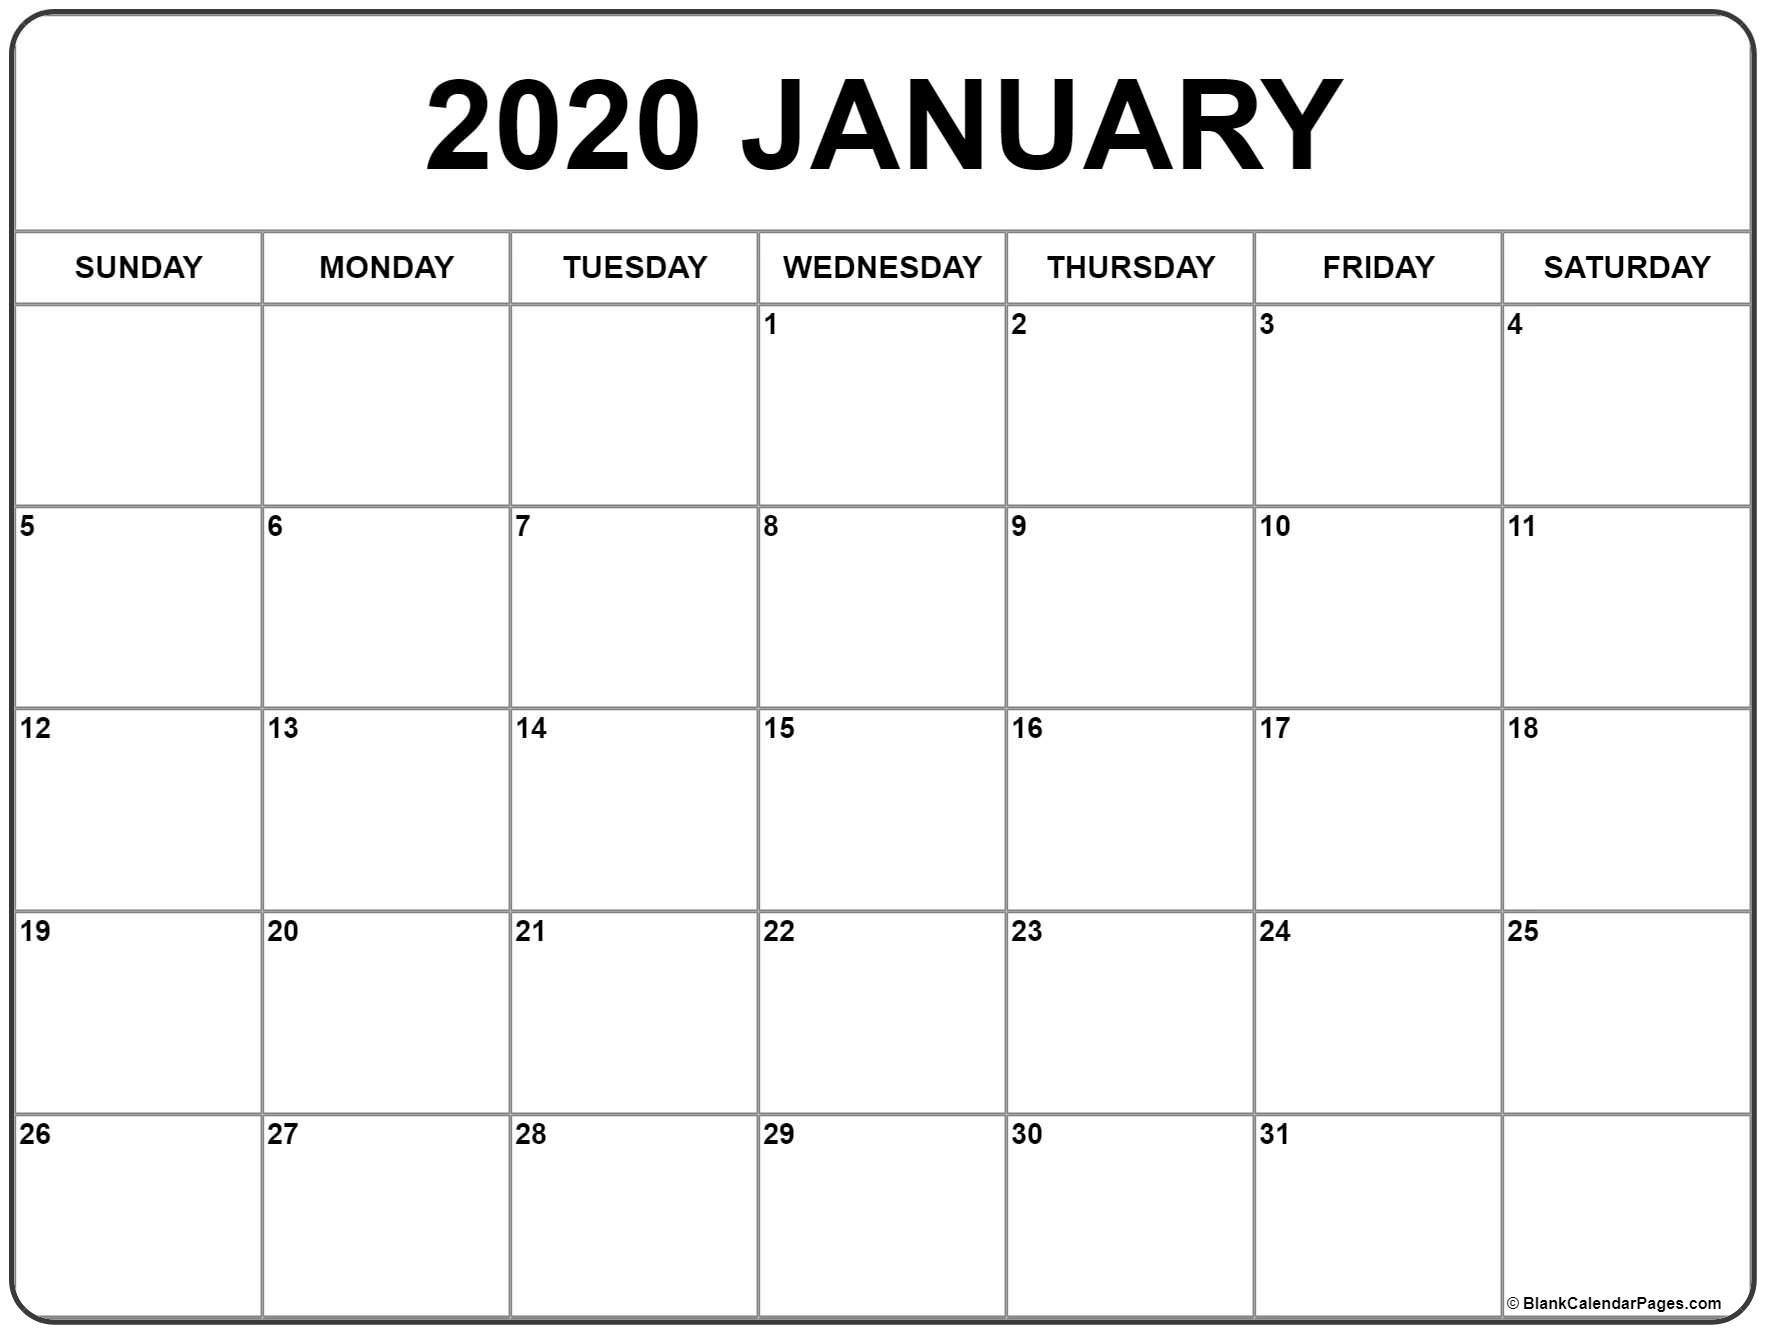 January 2020 Calendar | Free Printable Monthly Calendars-January 2020 Calendar Template